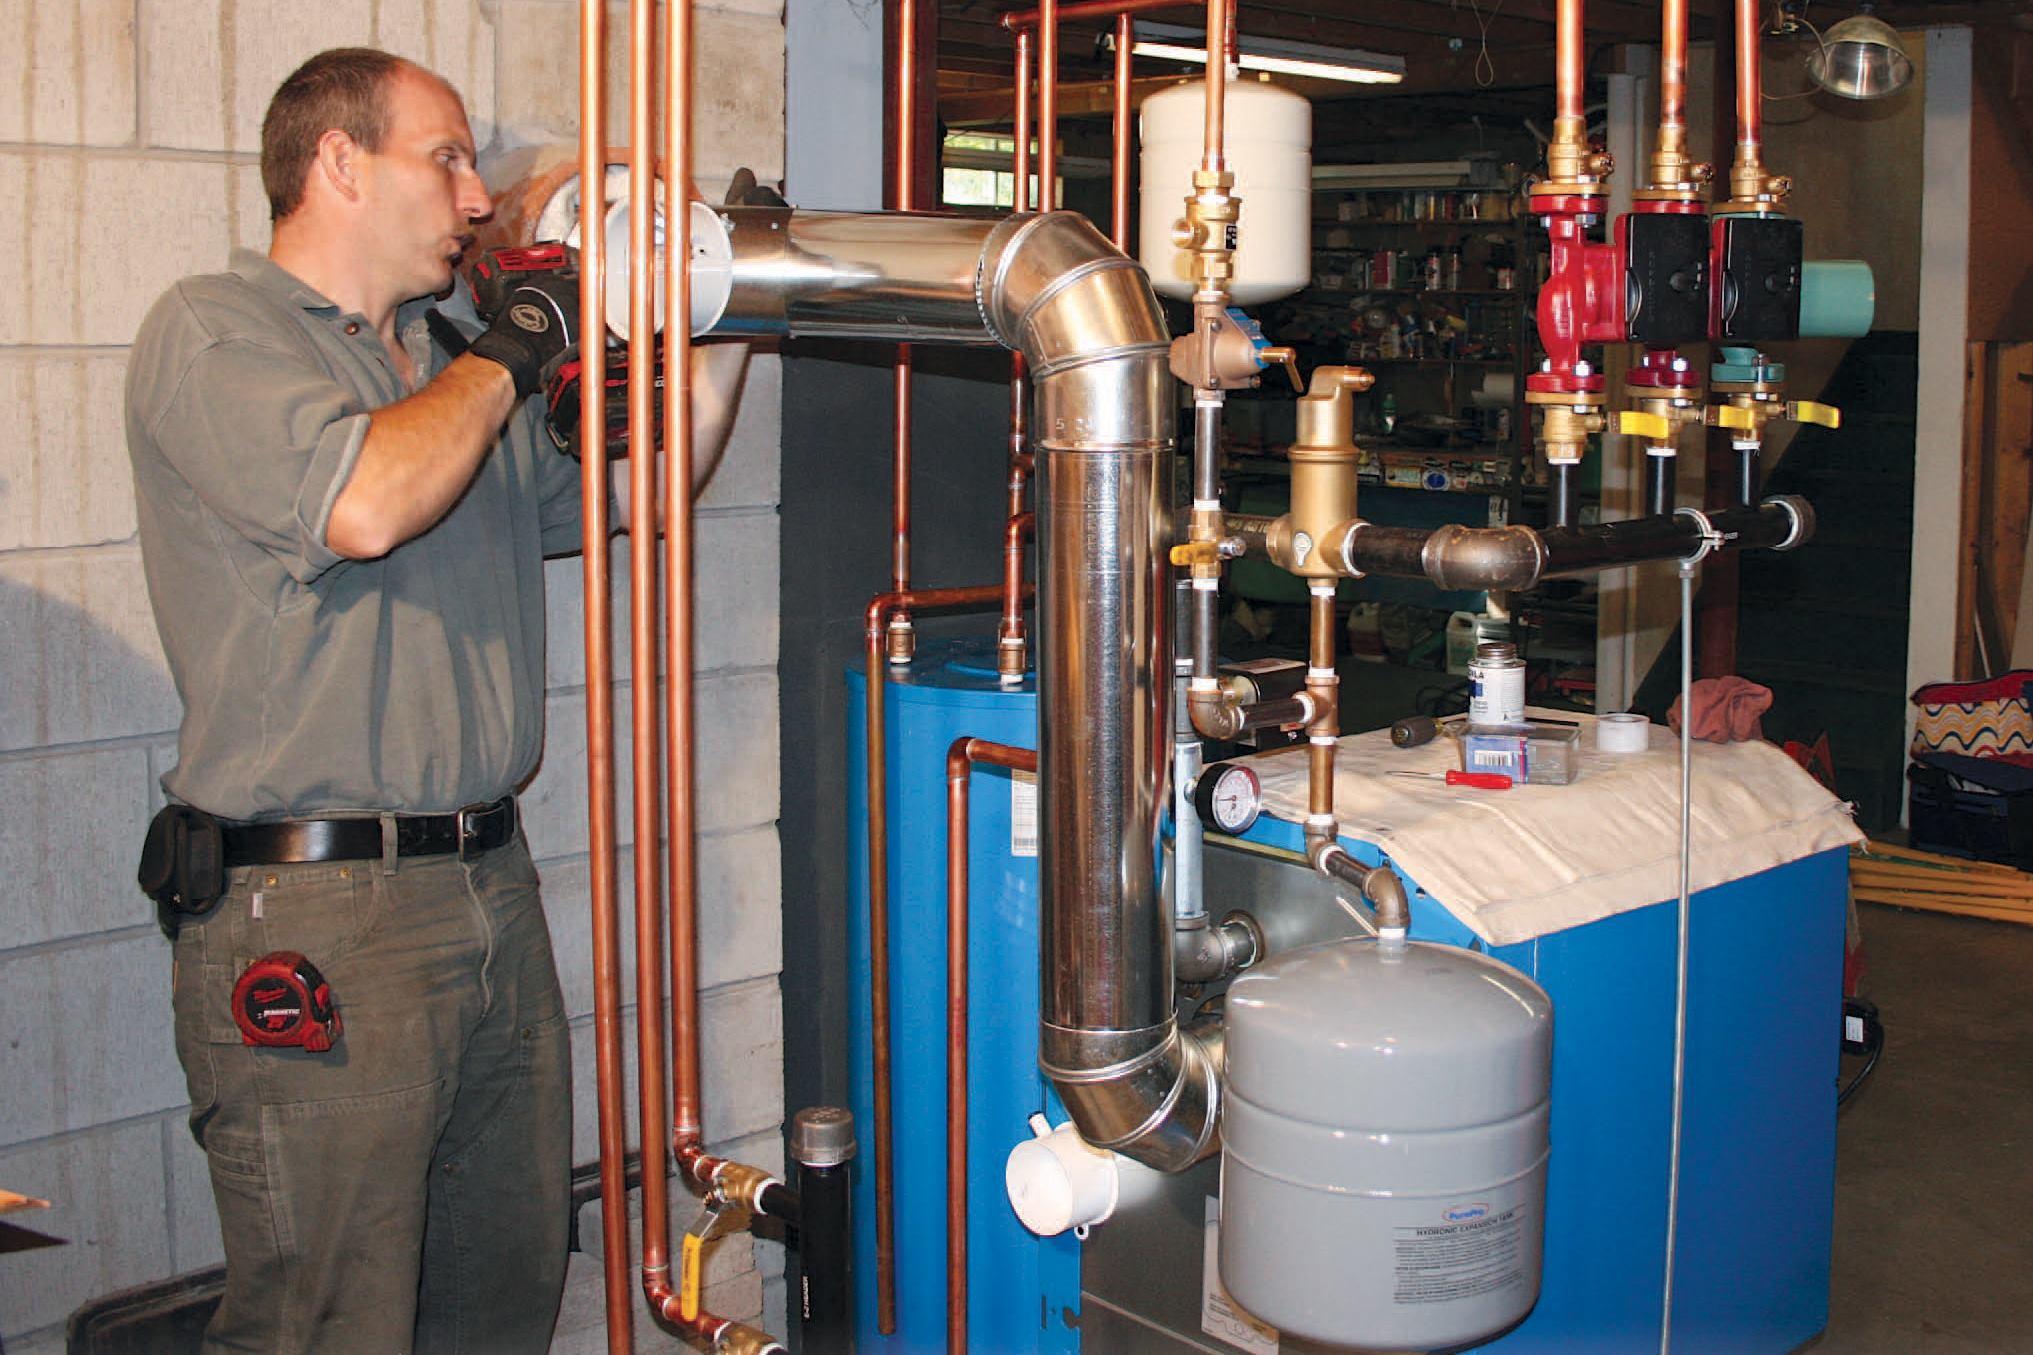 Installing An Efficient Noncondensing Boiler Jlc Online